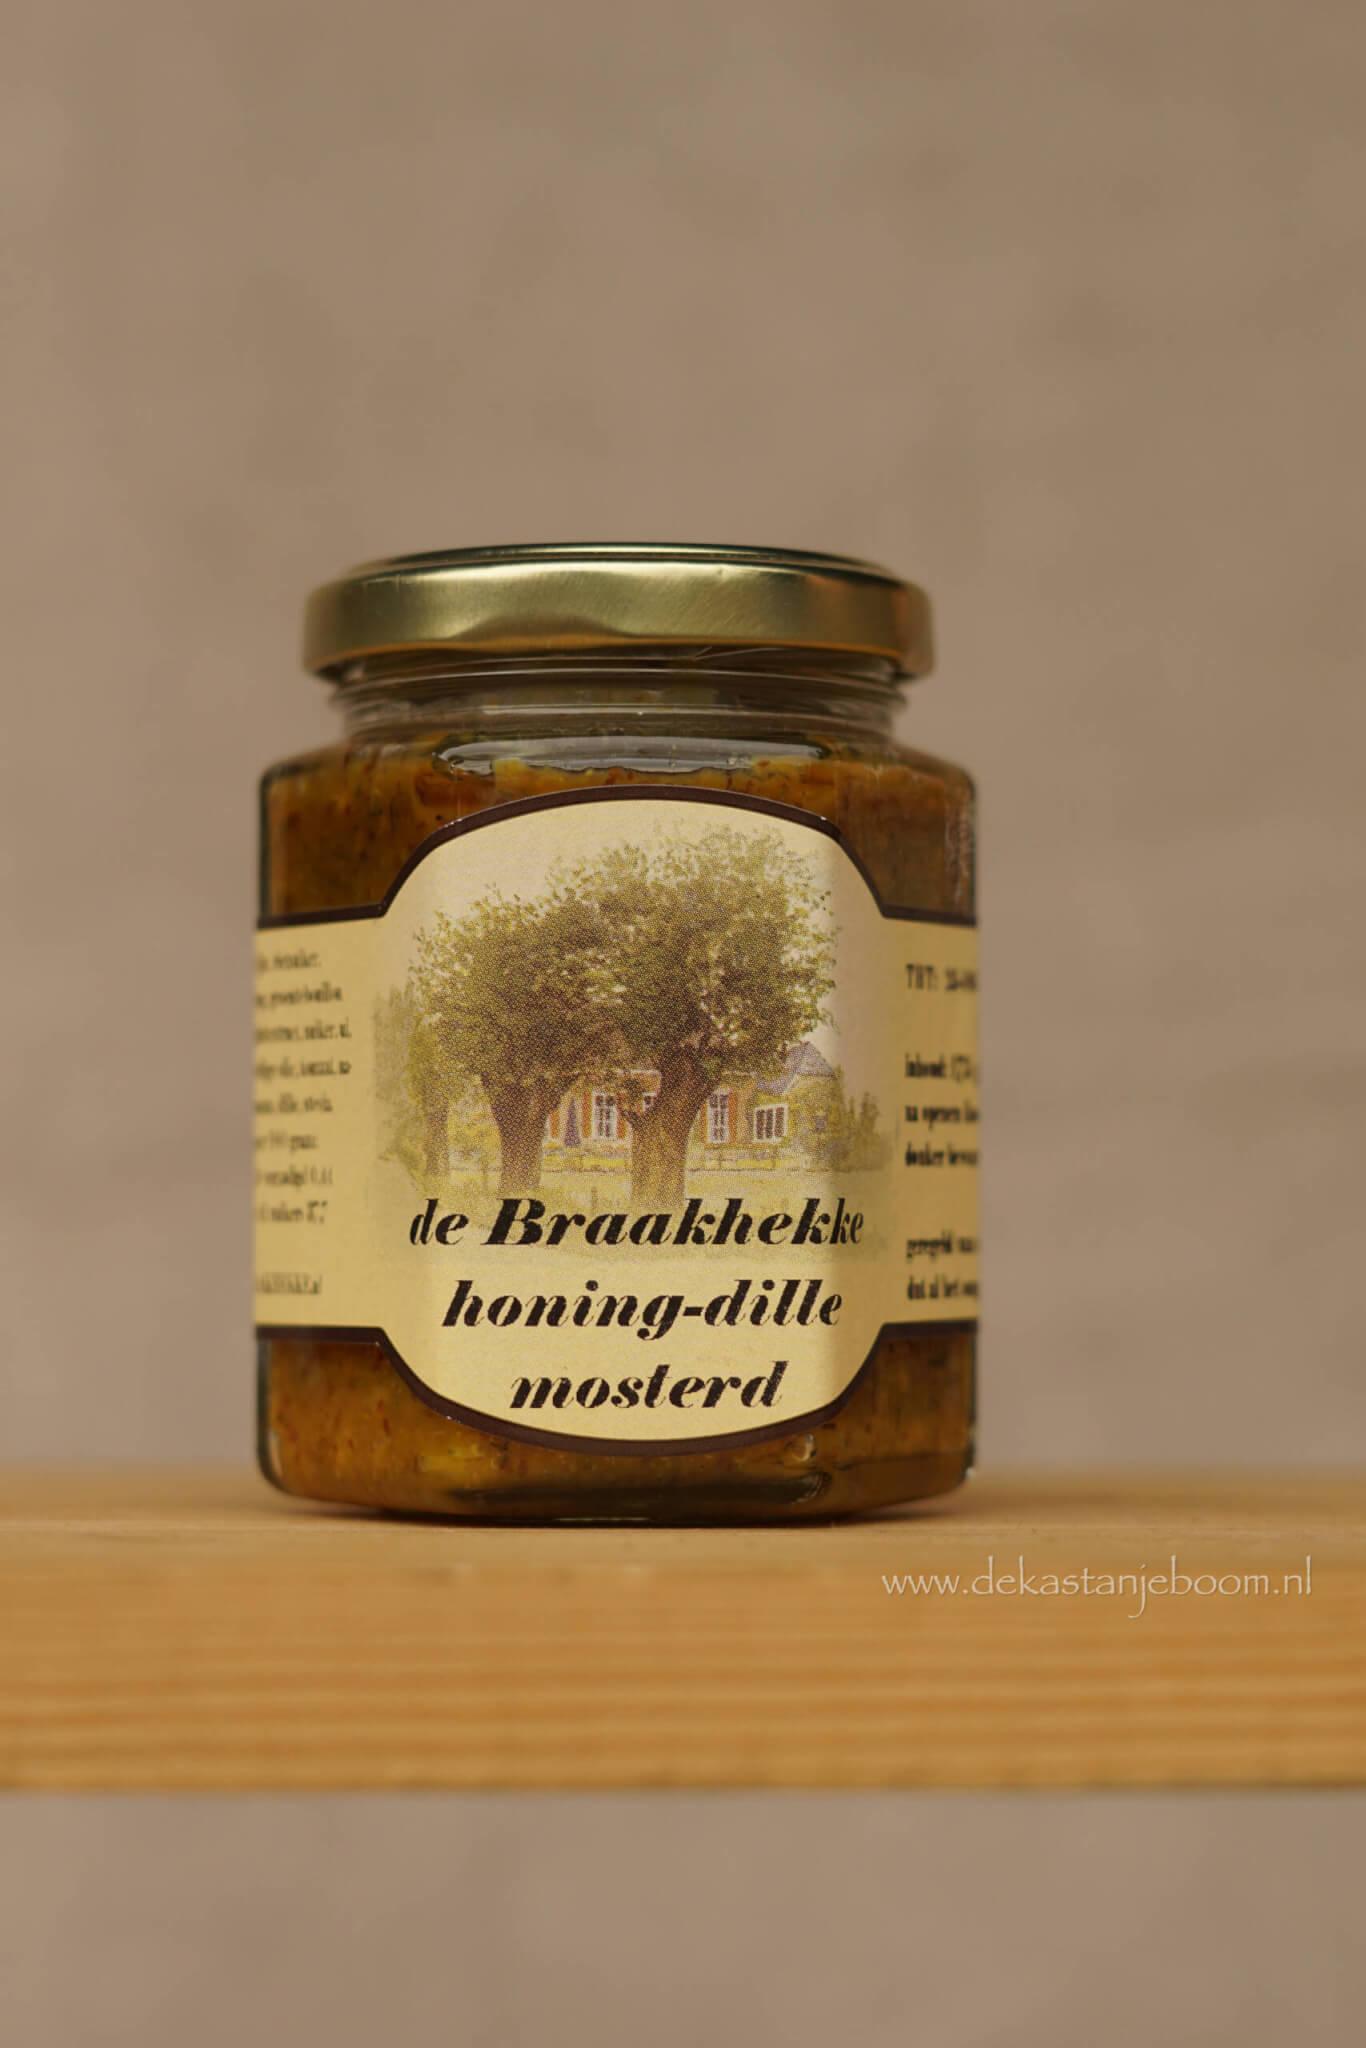 De Braakhekke honing-dille mosterd